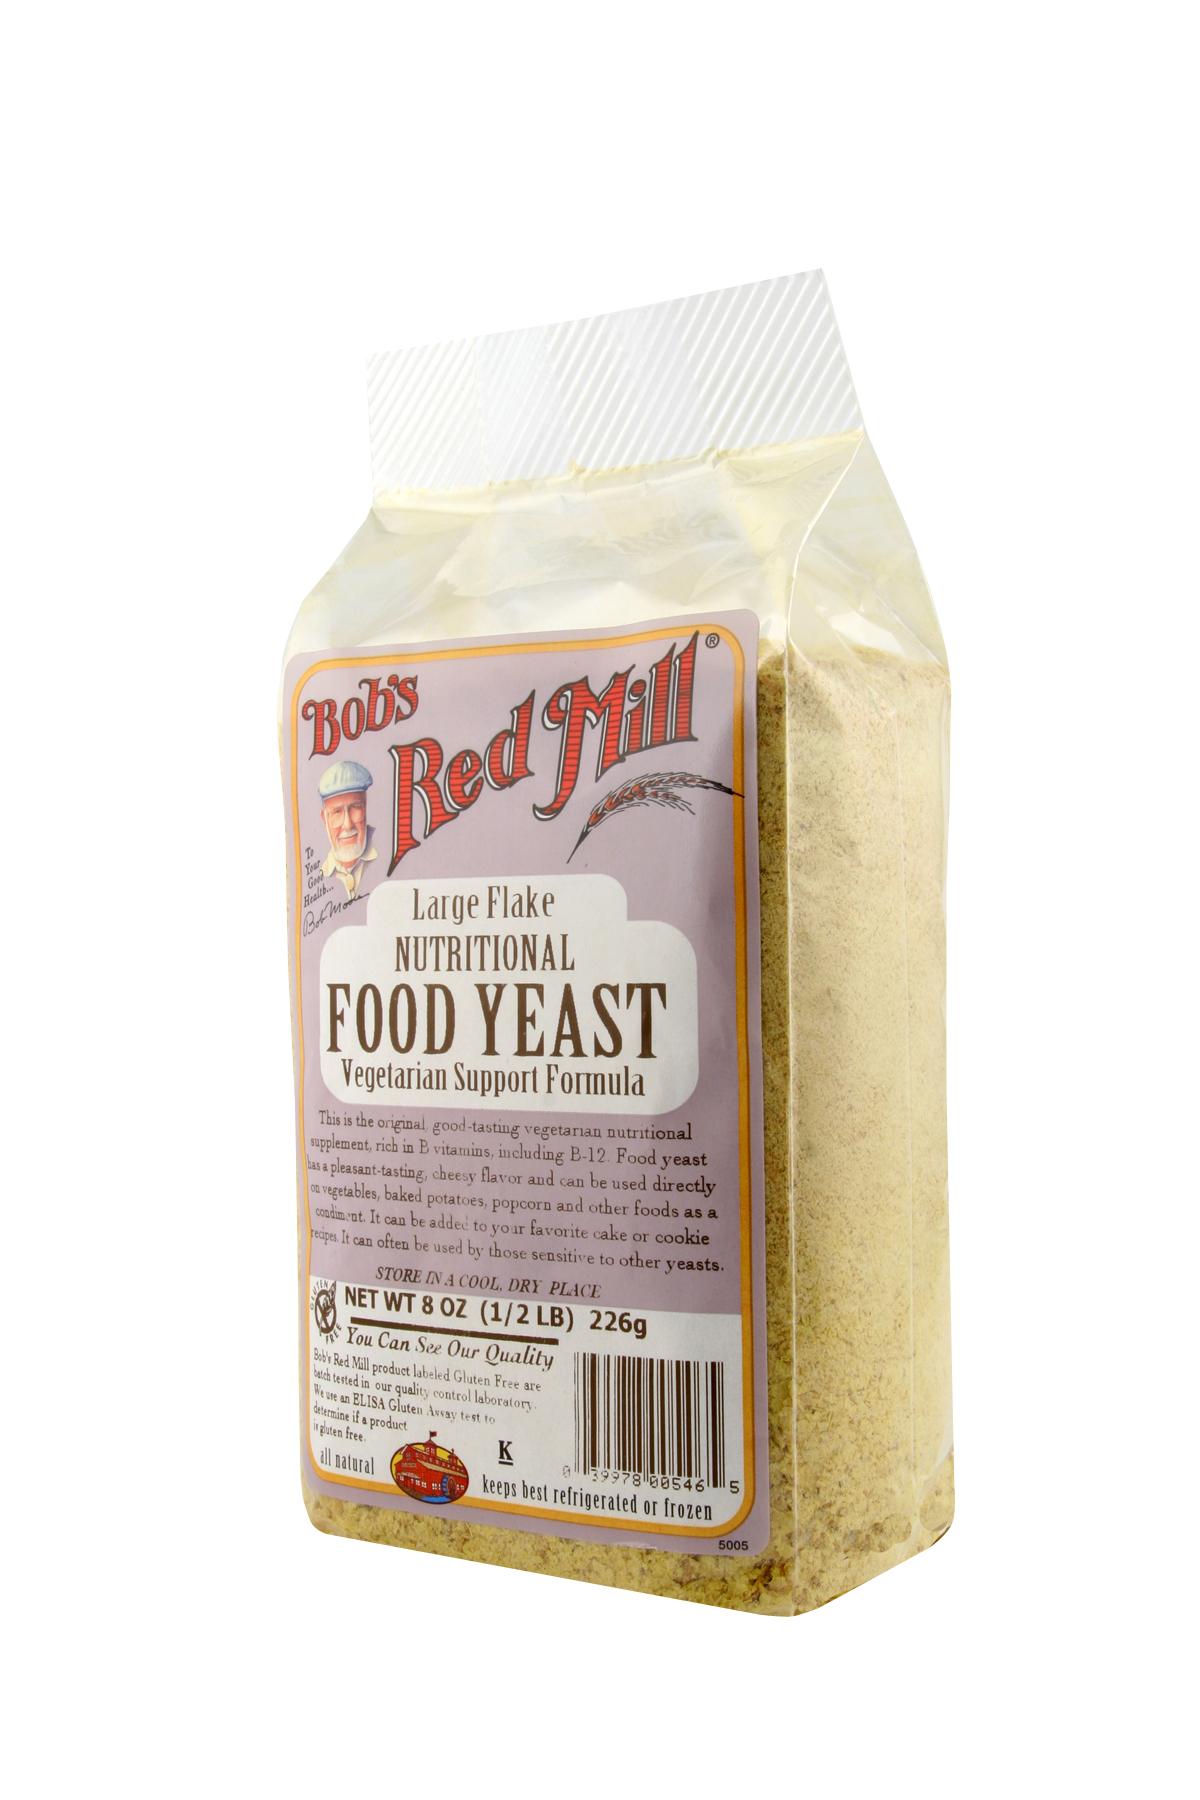 Nutritional Yeast: The Antiviral, Antibacterial Immune ...